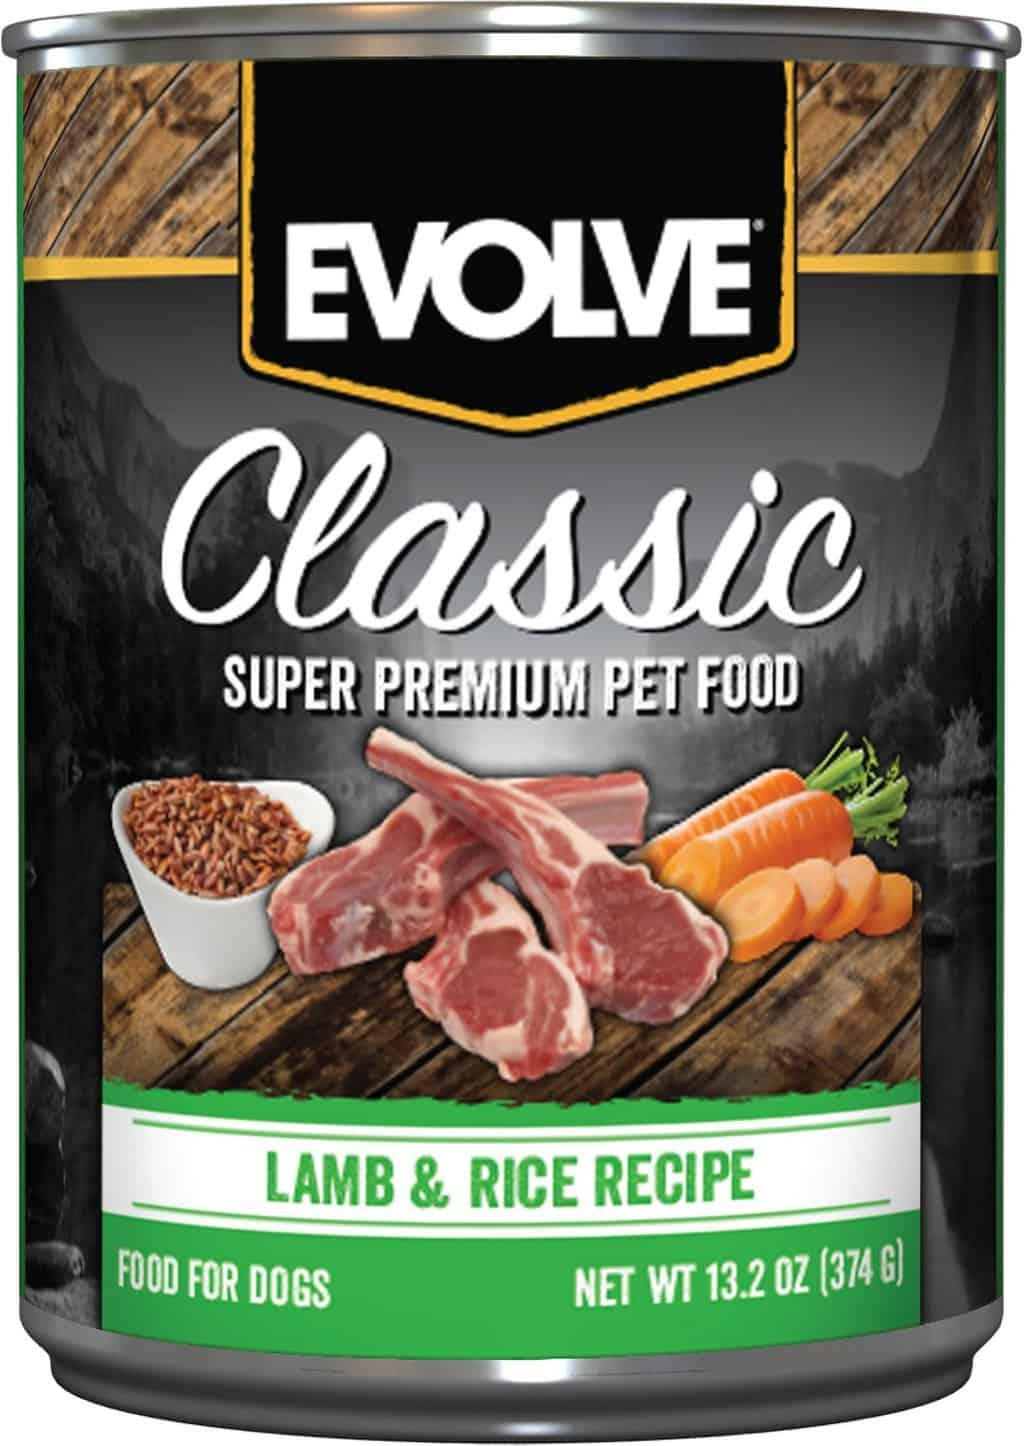 Evolve Dog Food Reviews [year]: Best Affordable, Premium Pet Food? 24